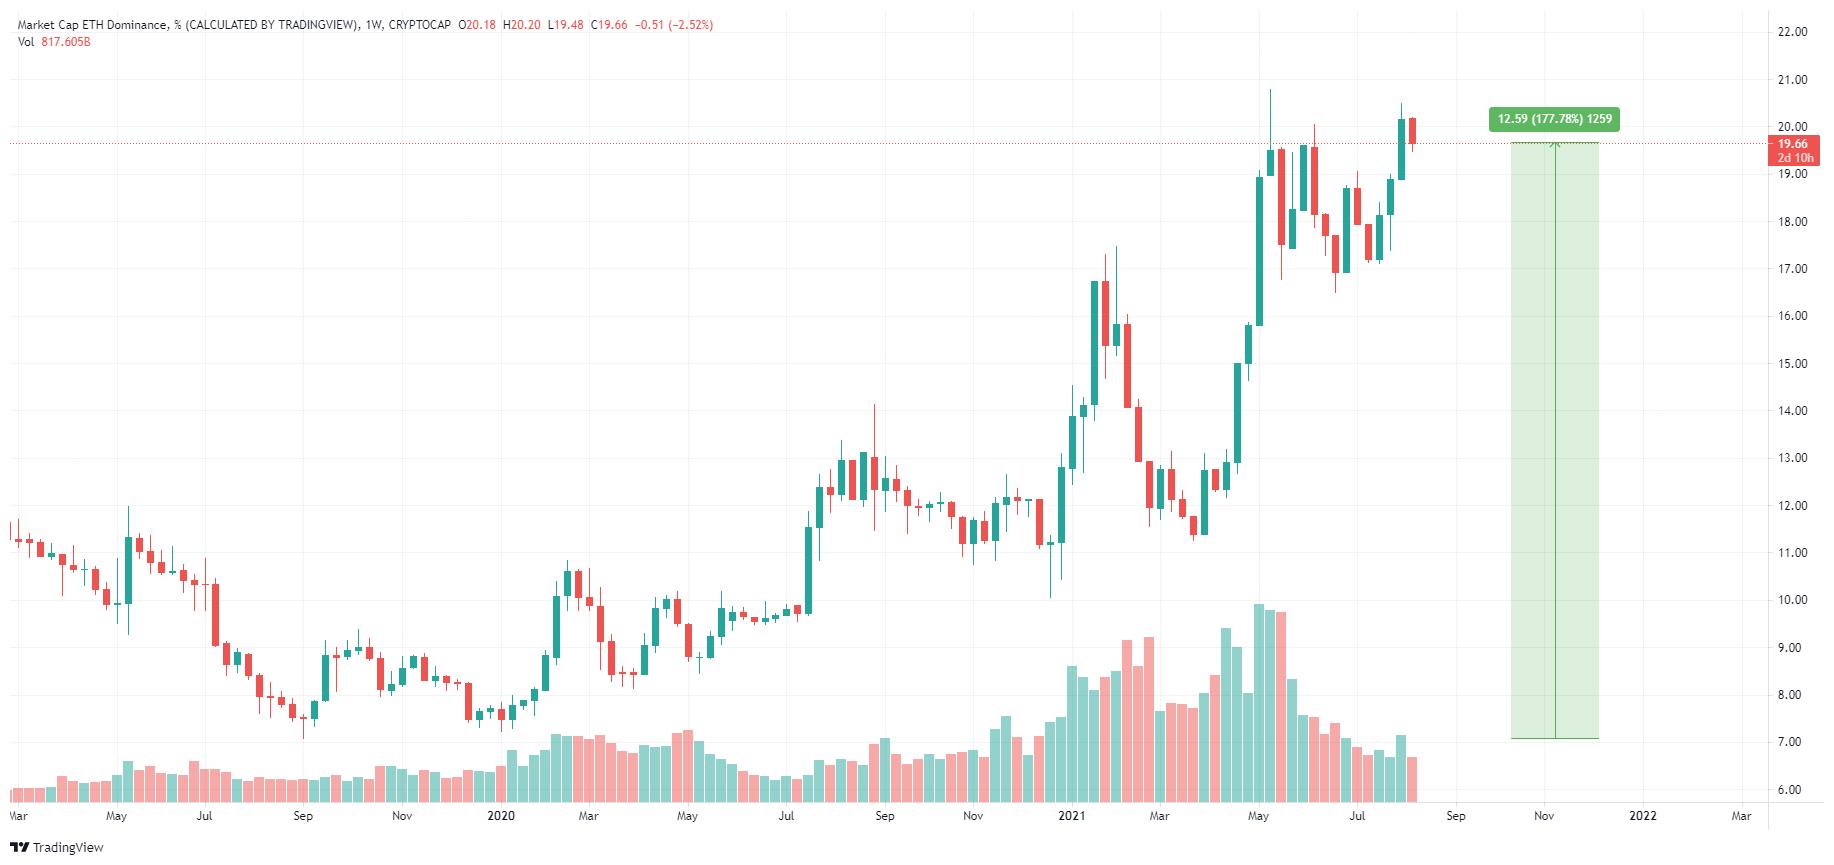 2 Eth Dominance Chart Bay Bilen Kripto Haber